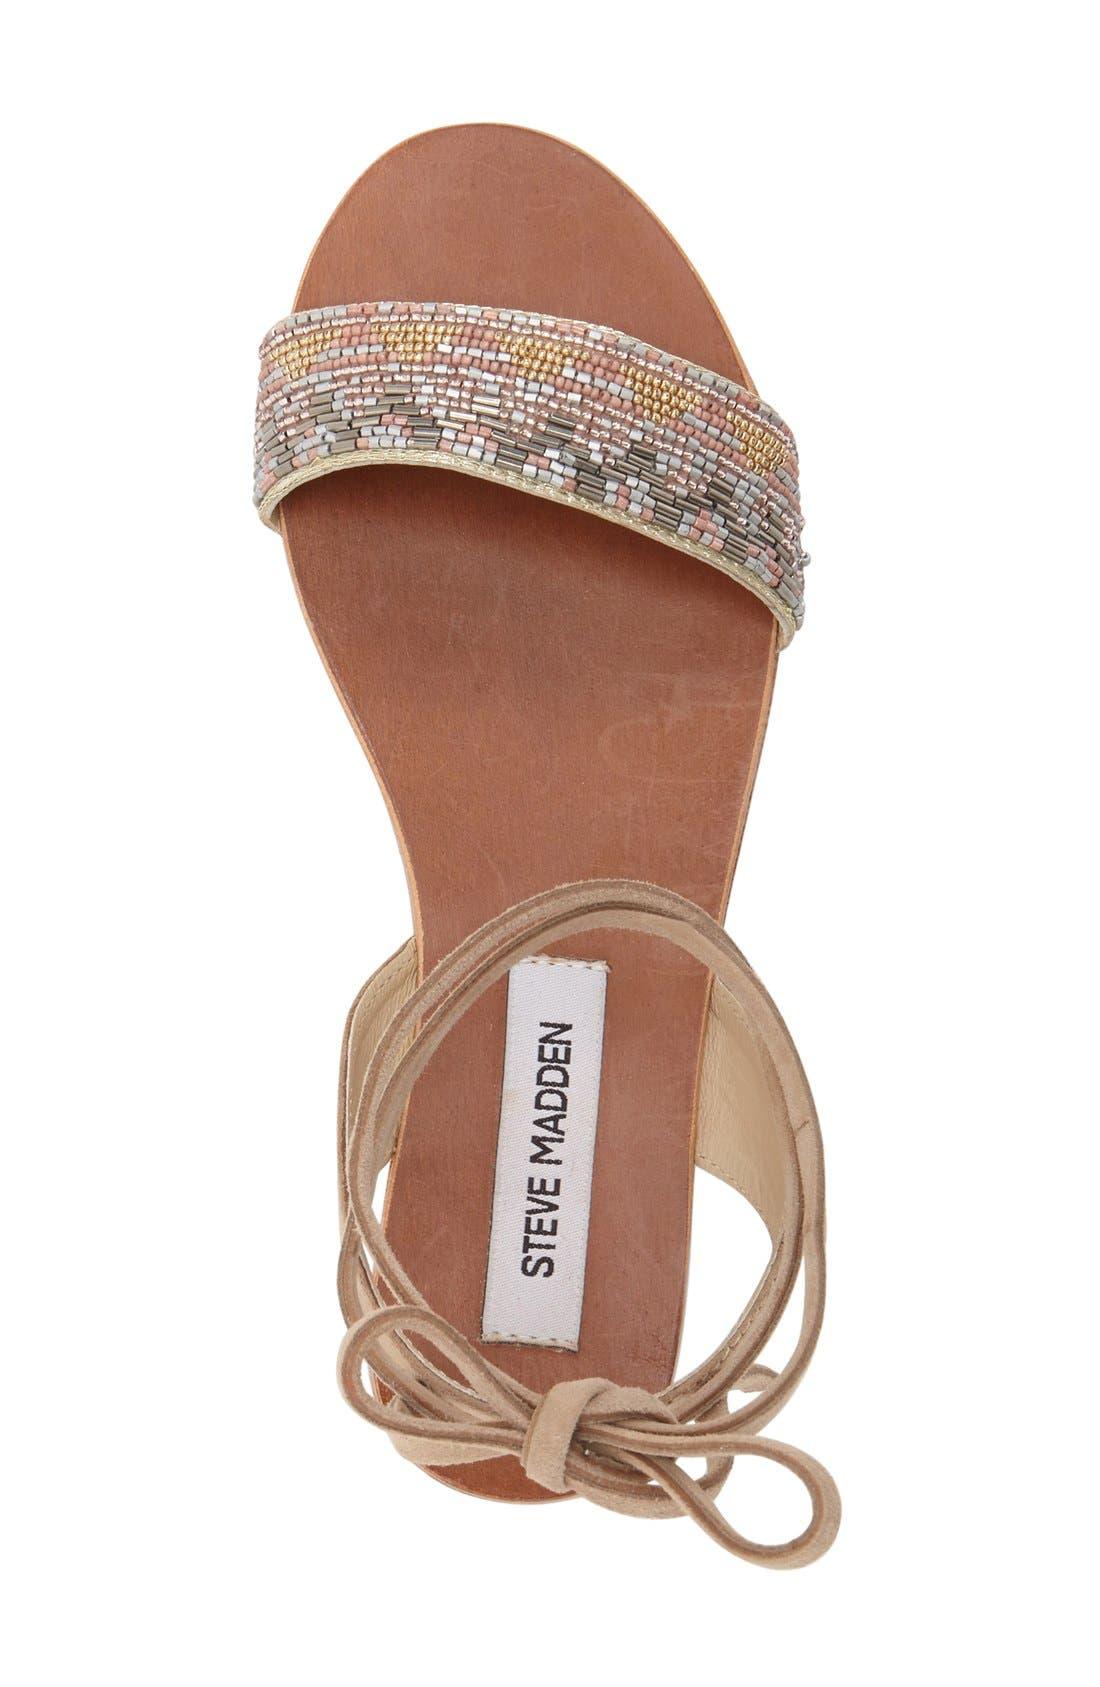 'Shaney' Beaded Wraparound Lace Sandal,                             Alternate thumbnail 5, color,                             250